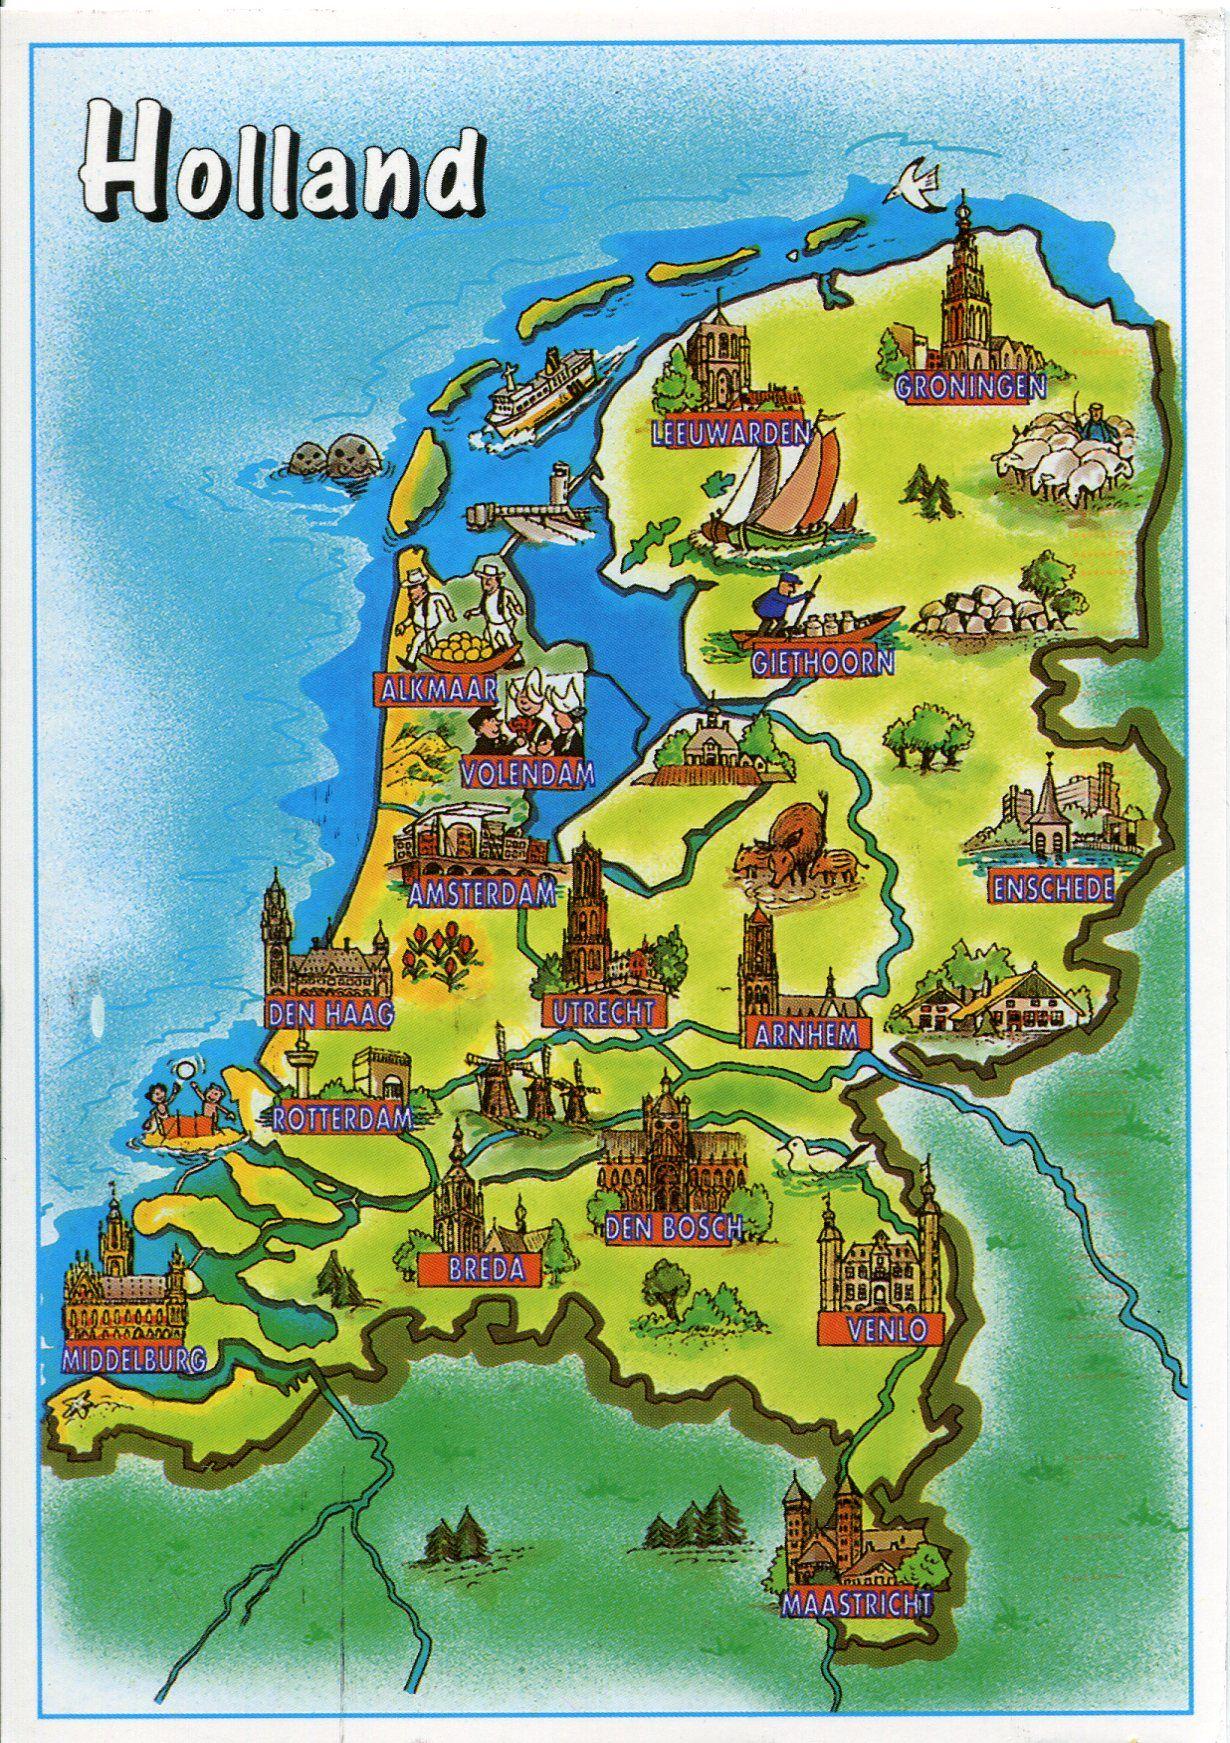 Olanda Cartina Turistica.Holland Netherlands Map Paesi Bassi Mappe Illustrate Carte Geografiche